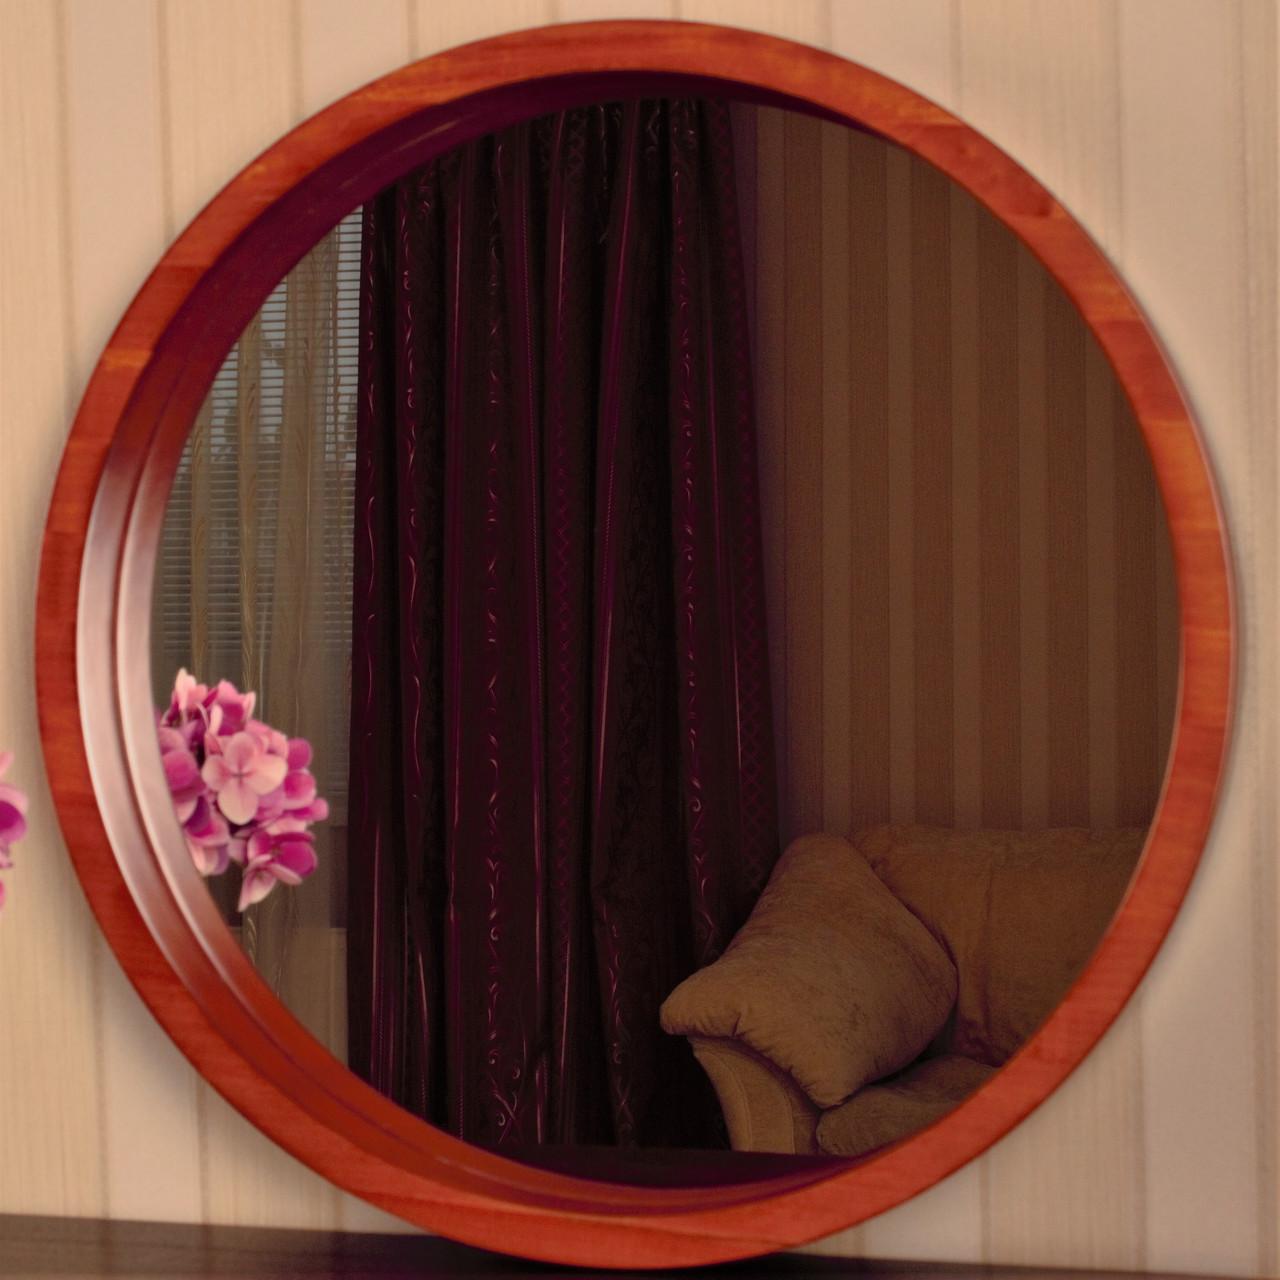 "Зеркало в круглой деревянной раме/Диаметр 520 мм/ Зеркало в дереве цвет ""Вишня""/ Код MDD 2.1/3"